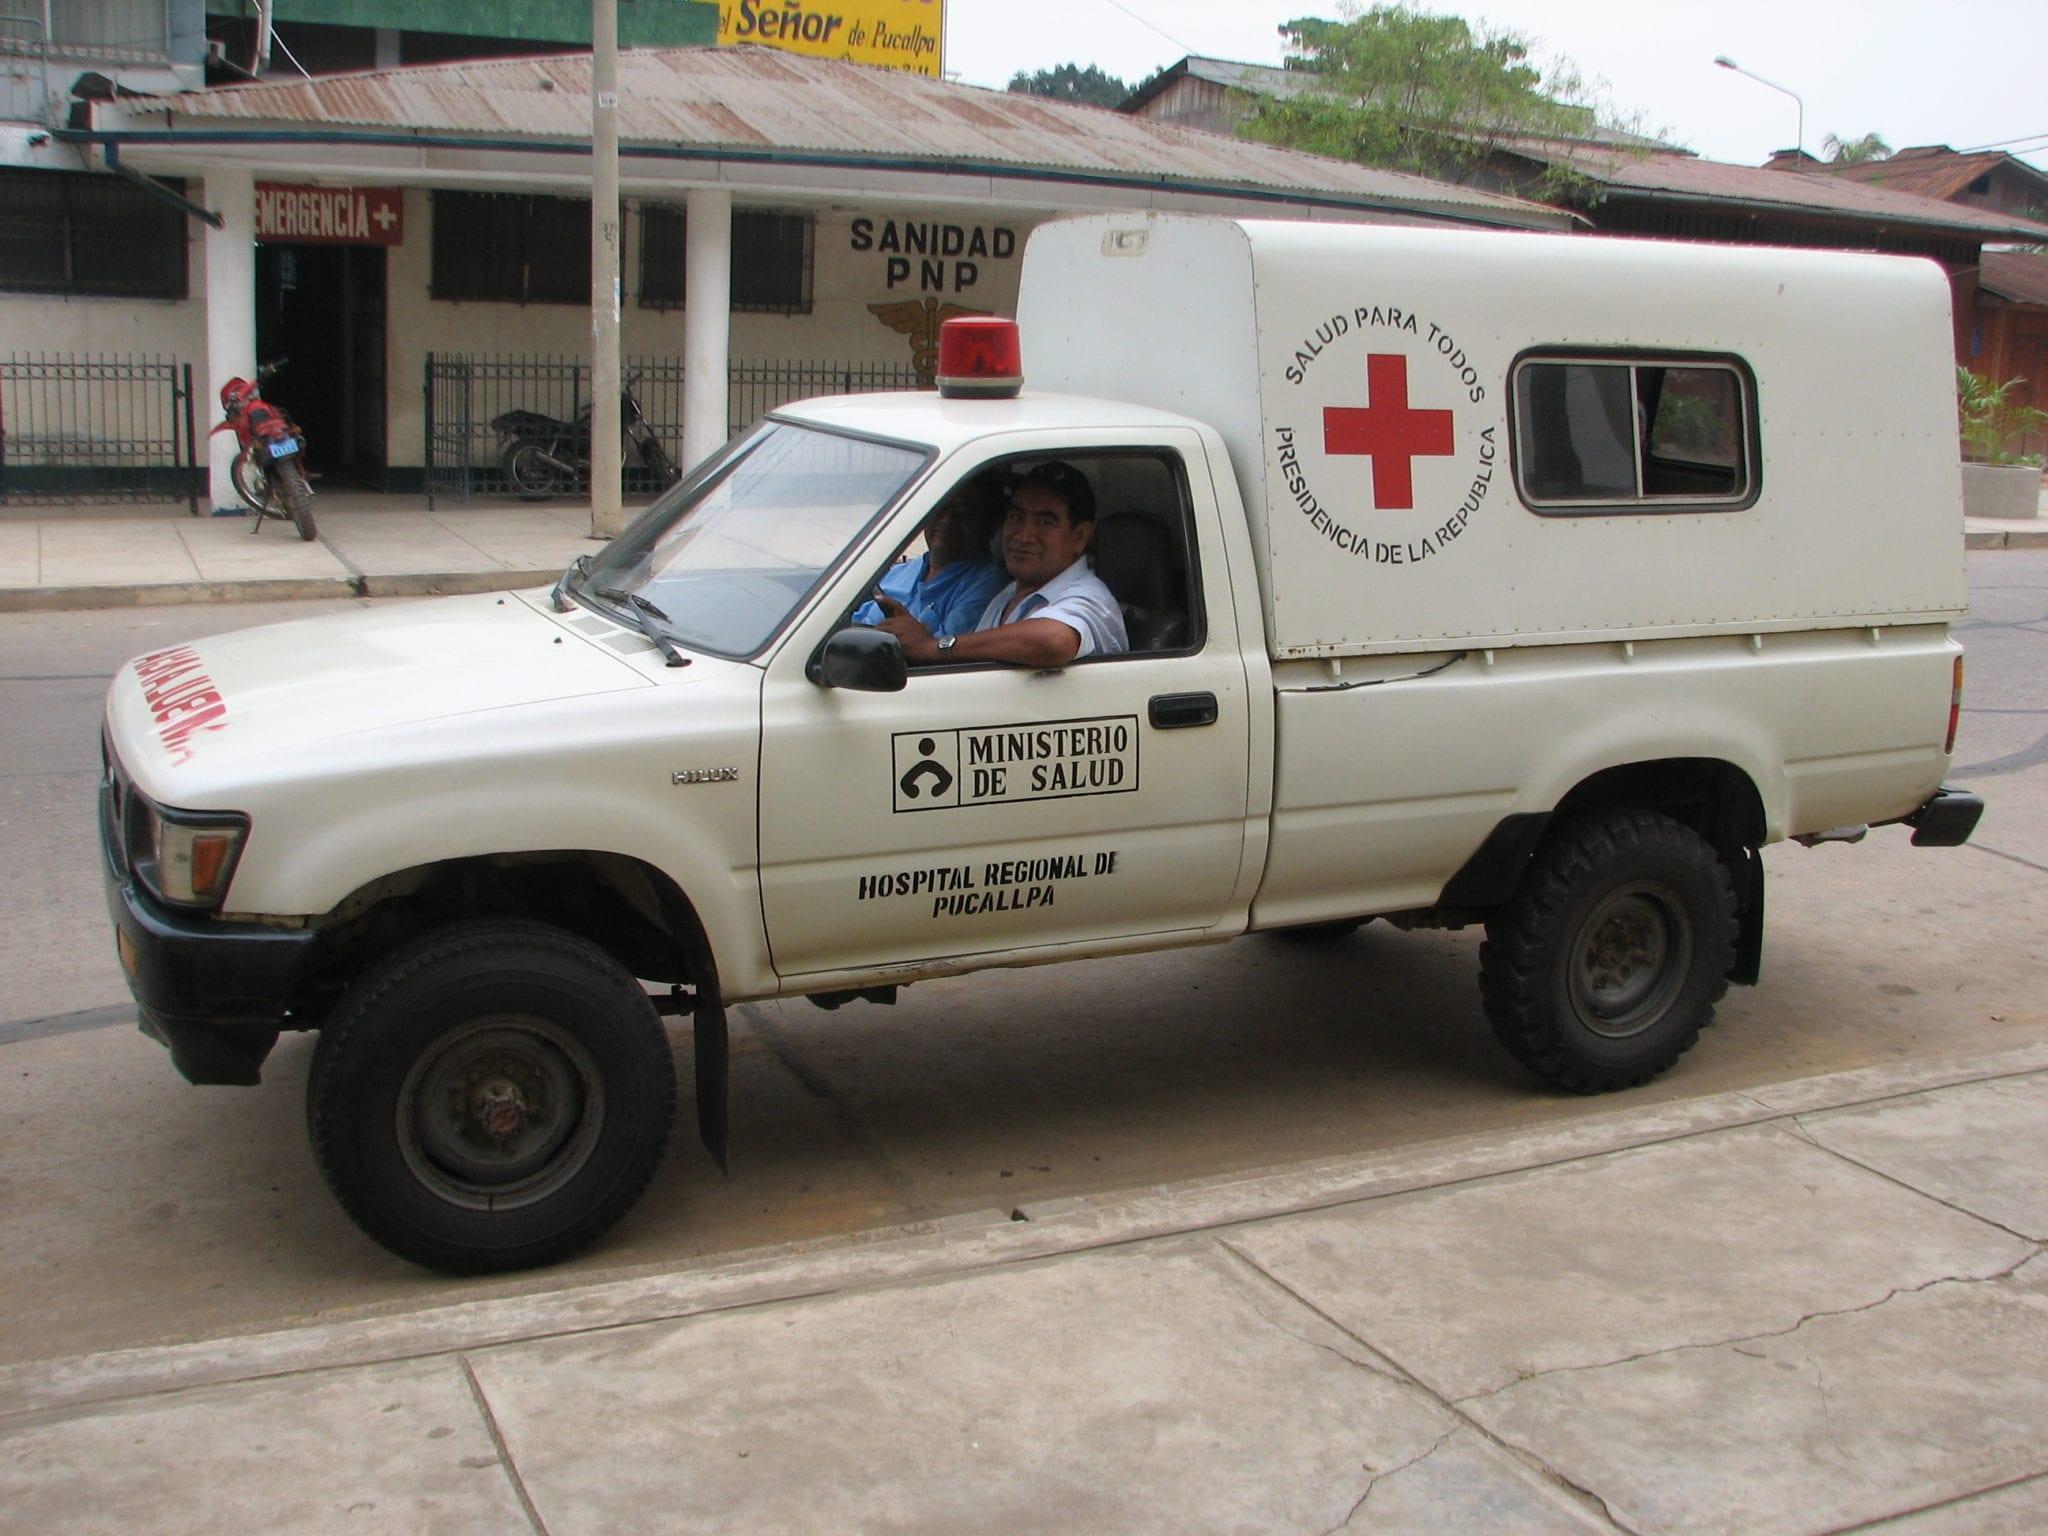 Ministry of Health Ambulance - Peru medical cannabis